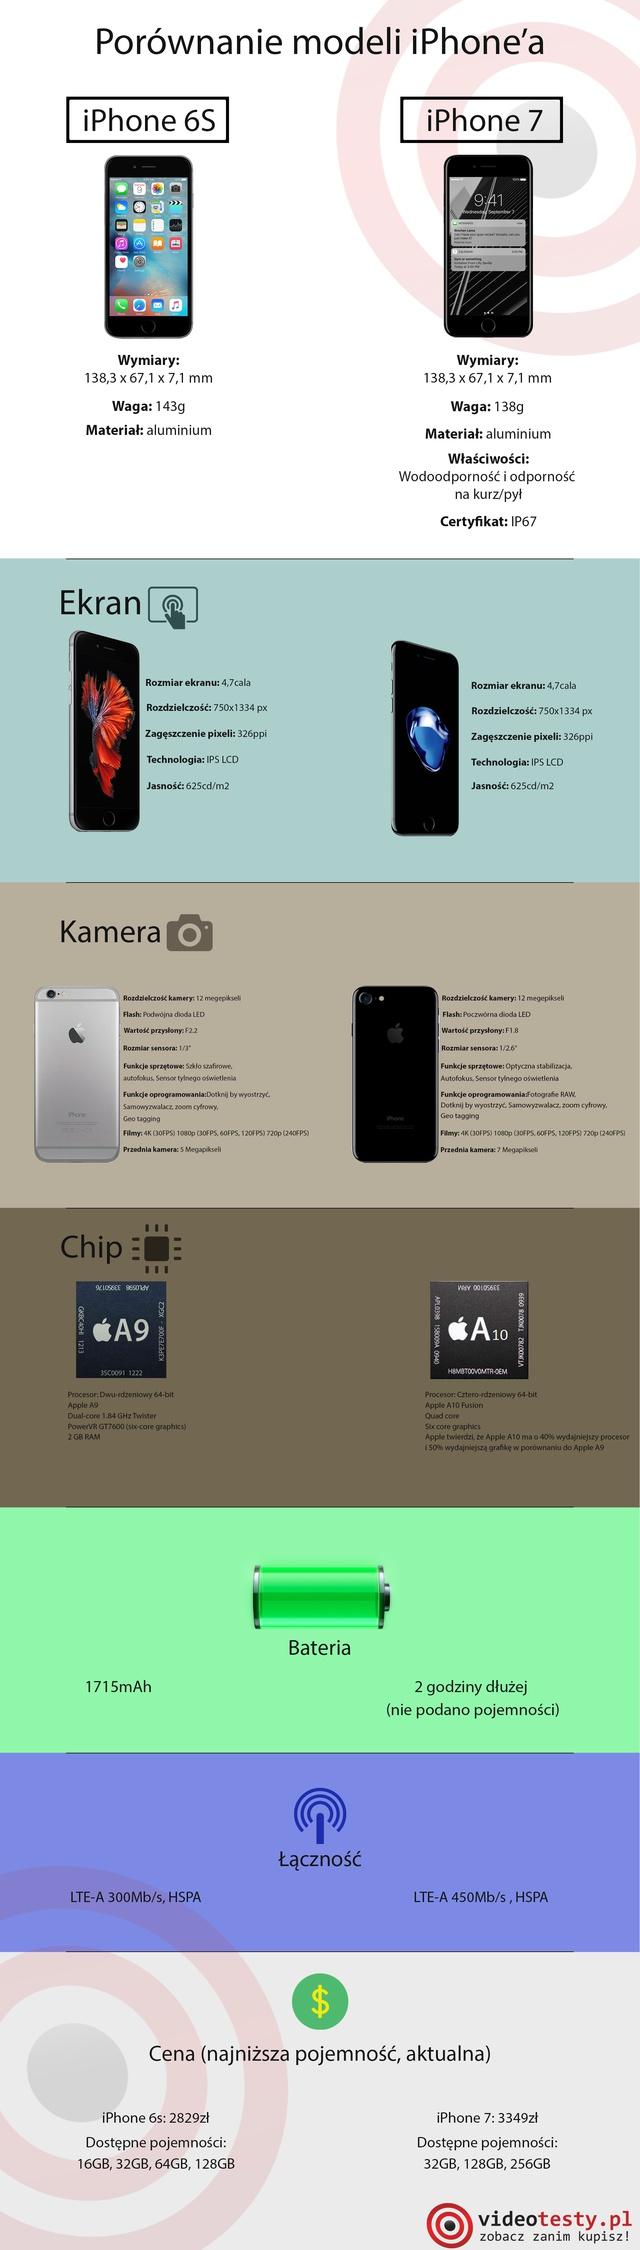 Porównanie iPhone 6S vs iPhone 7 - VideoTesty.pl